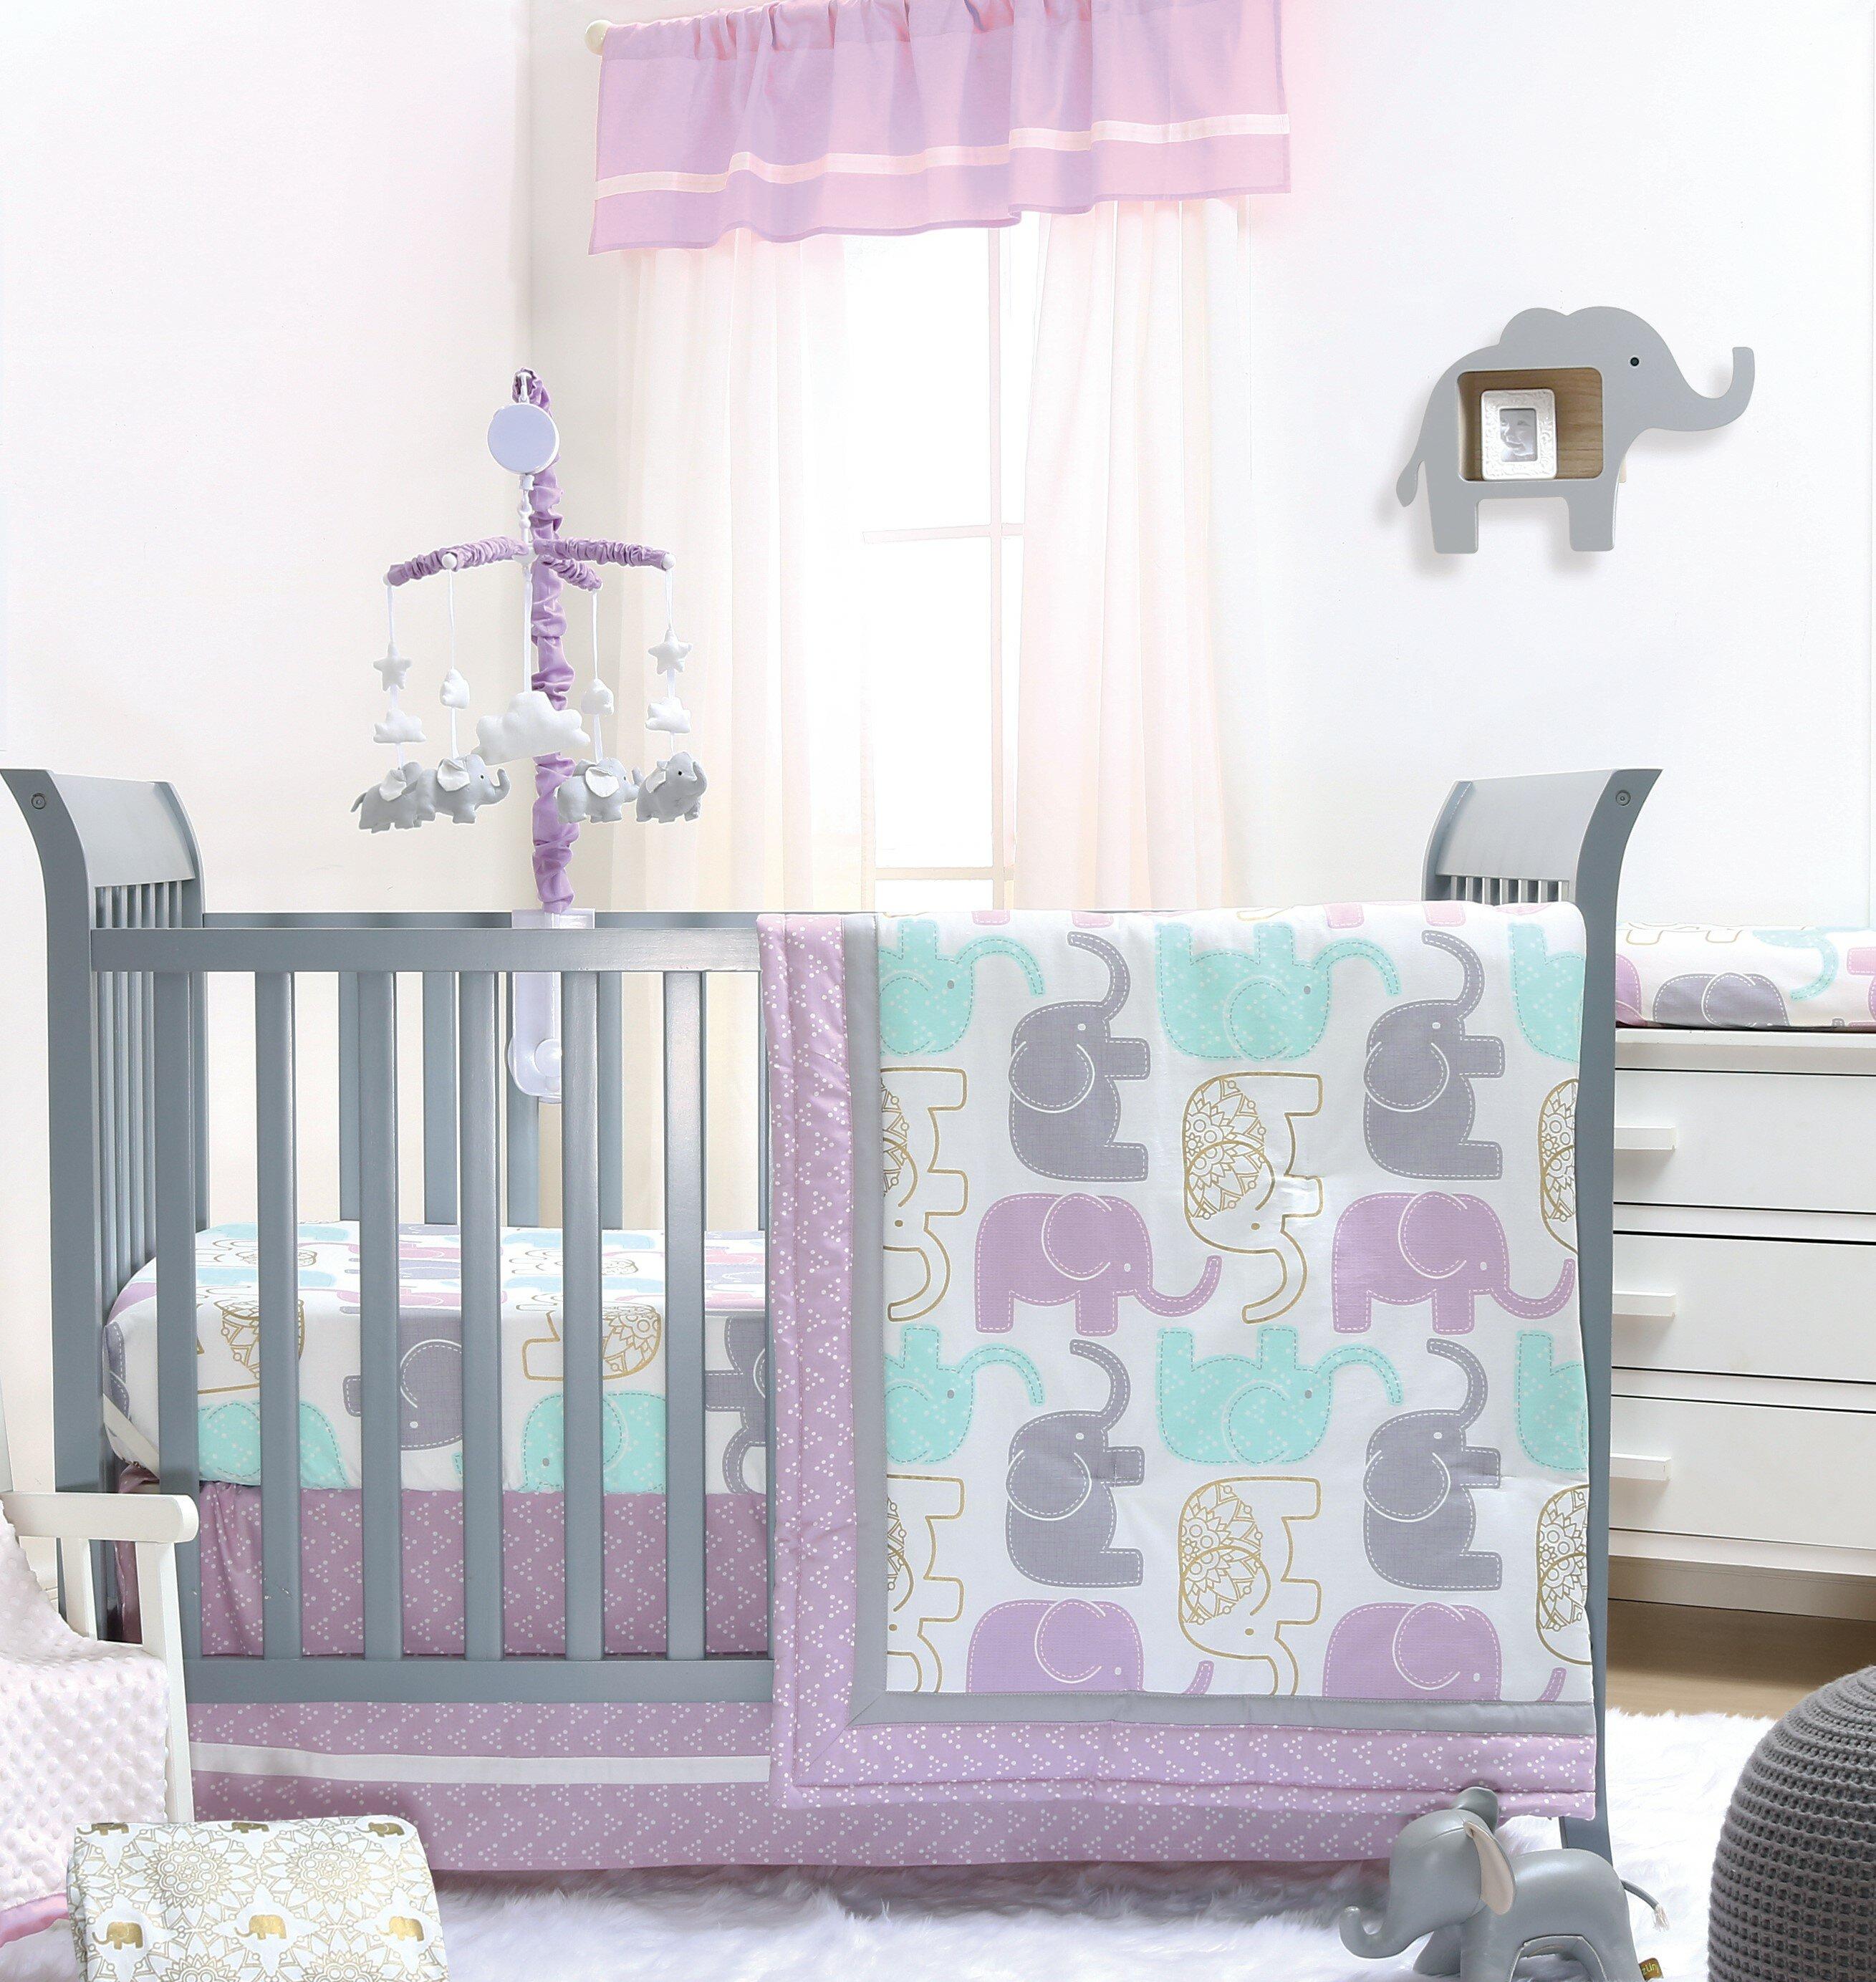 ed153aaa96b4 The Peanut Shell Little Peanut 6 Piece Crib Bedding Set   Reviews ...